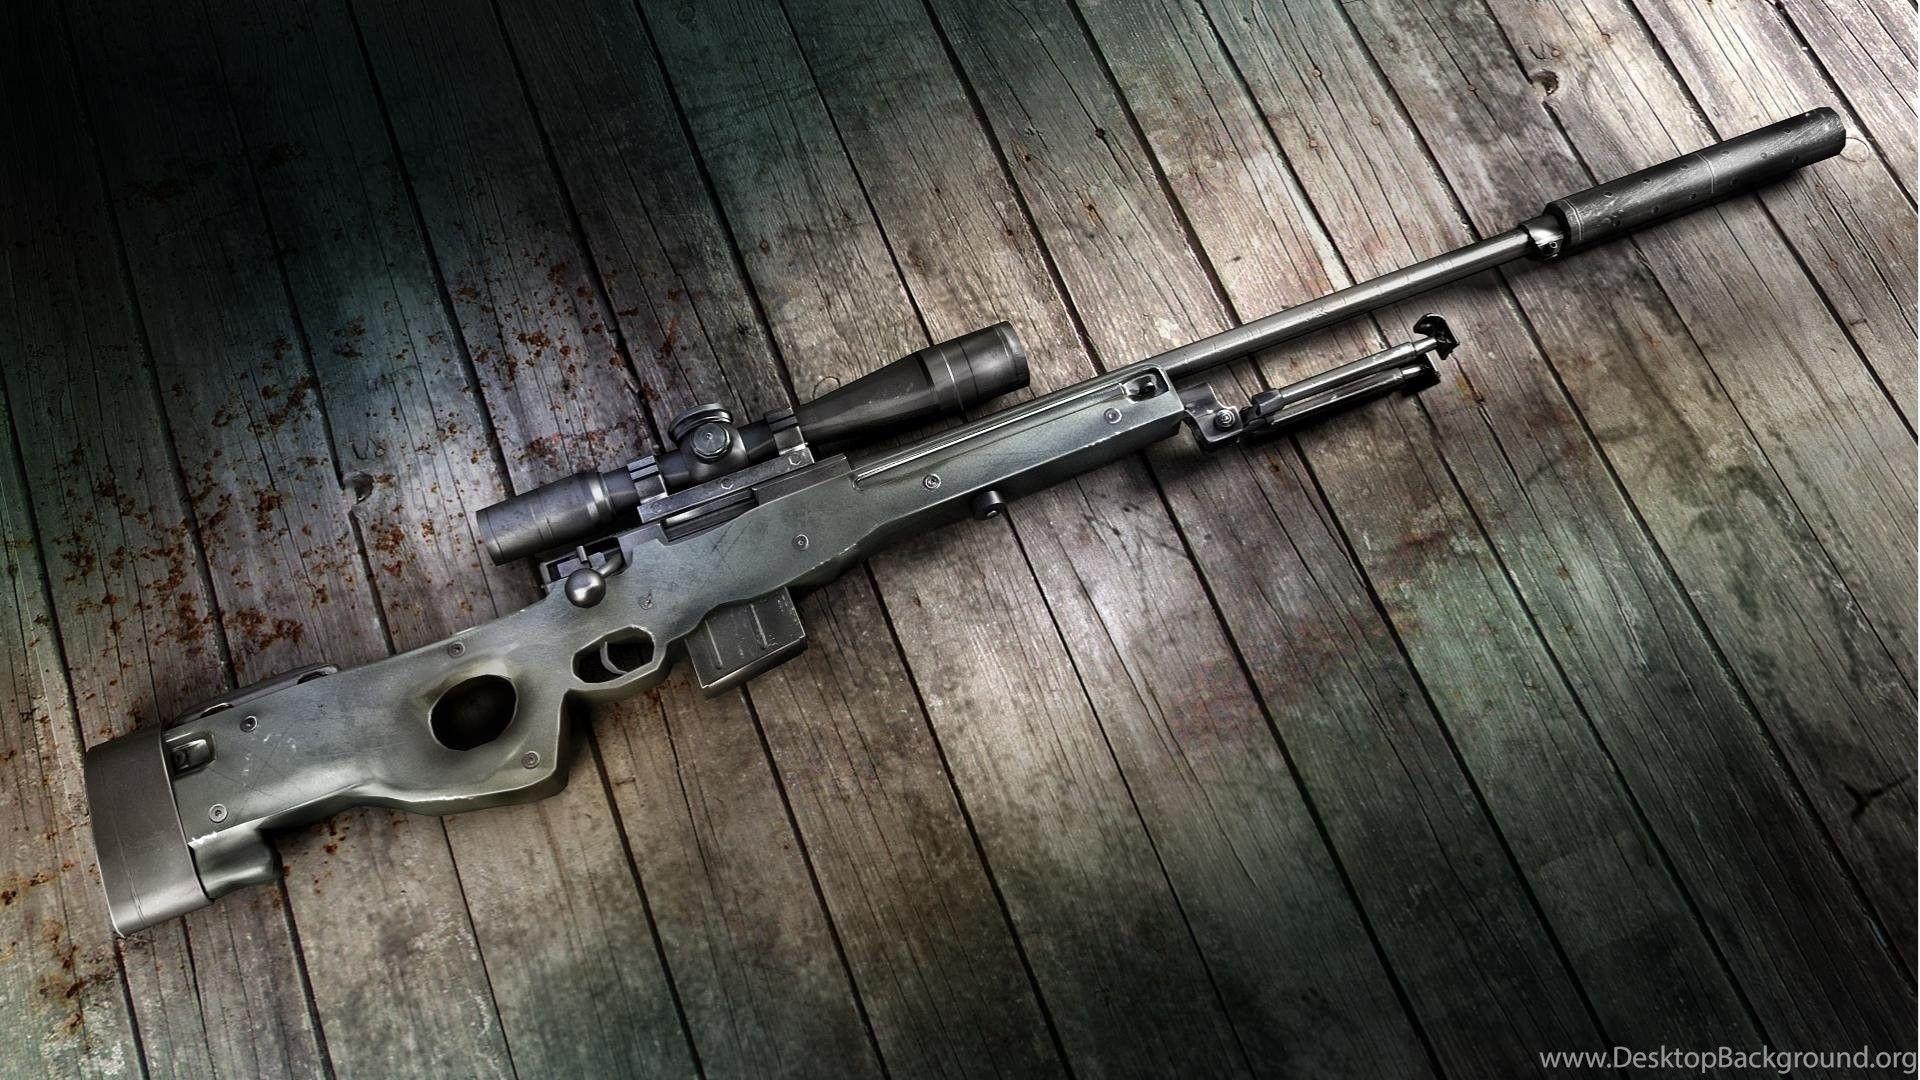 pubg gun awm، pubg 1920x1080، free pubg، pubg رمز سطح المكتب